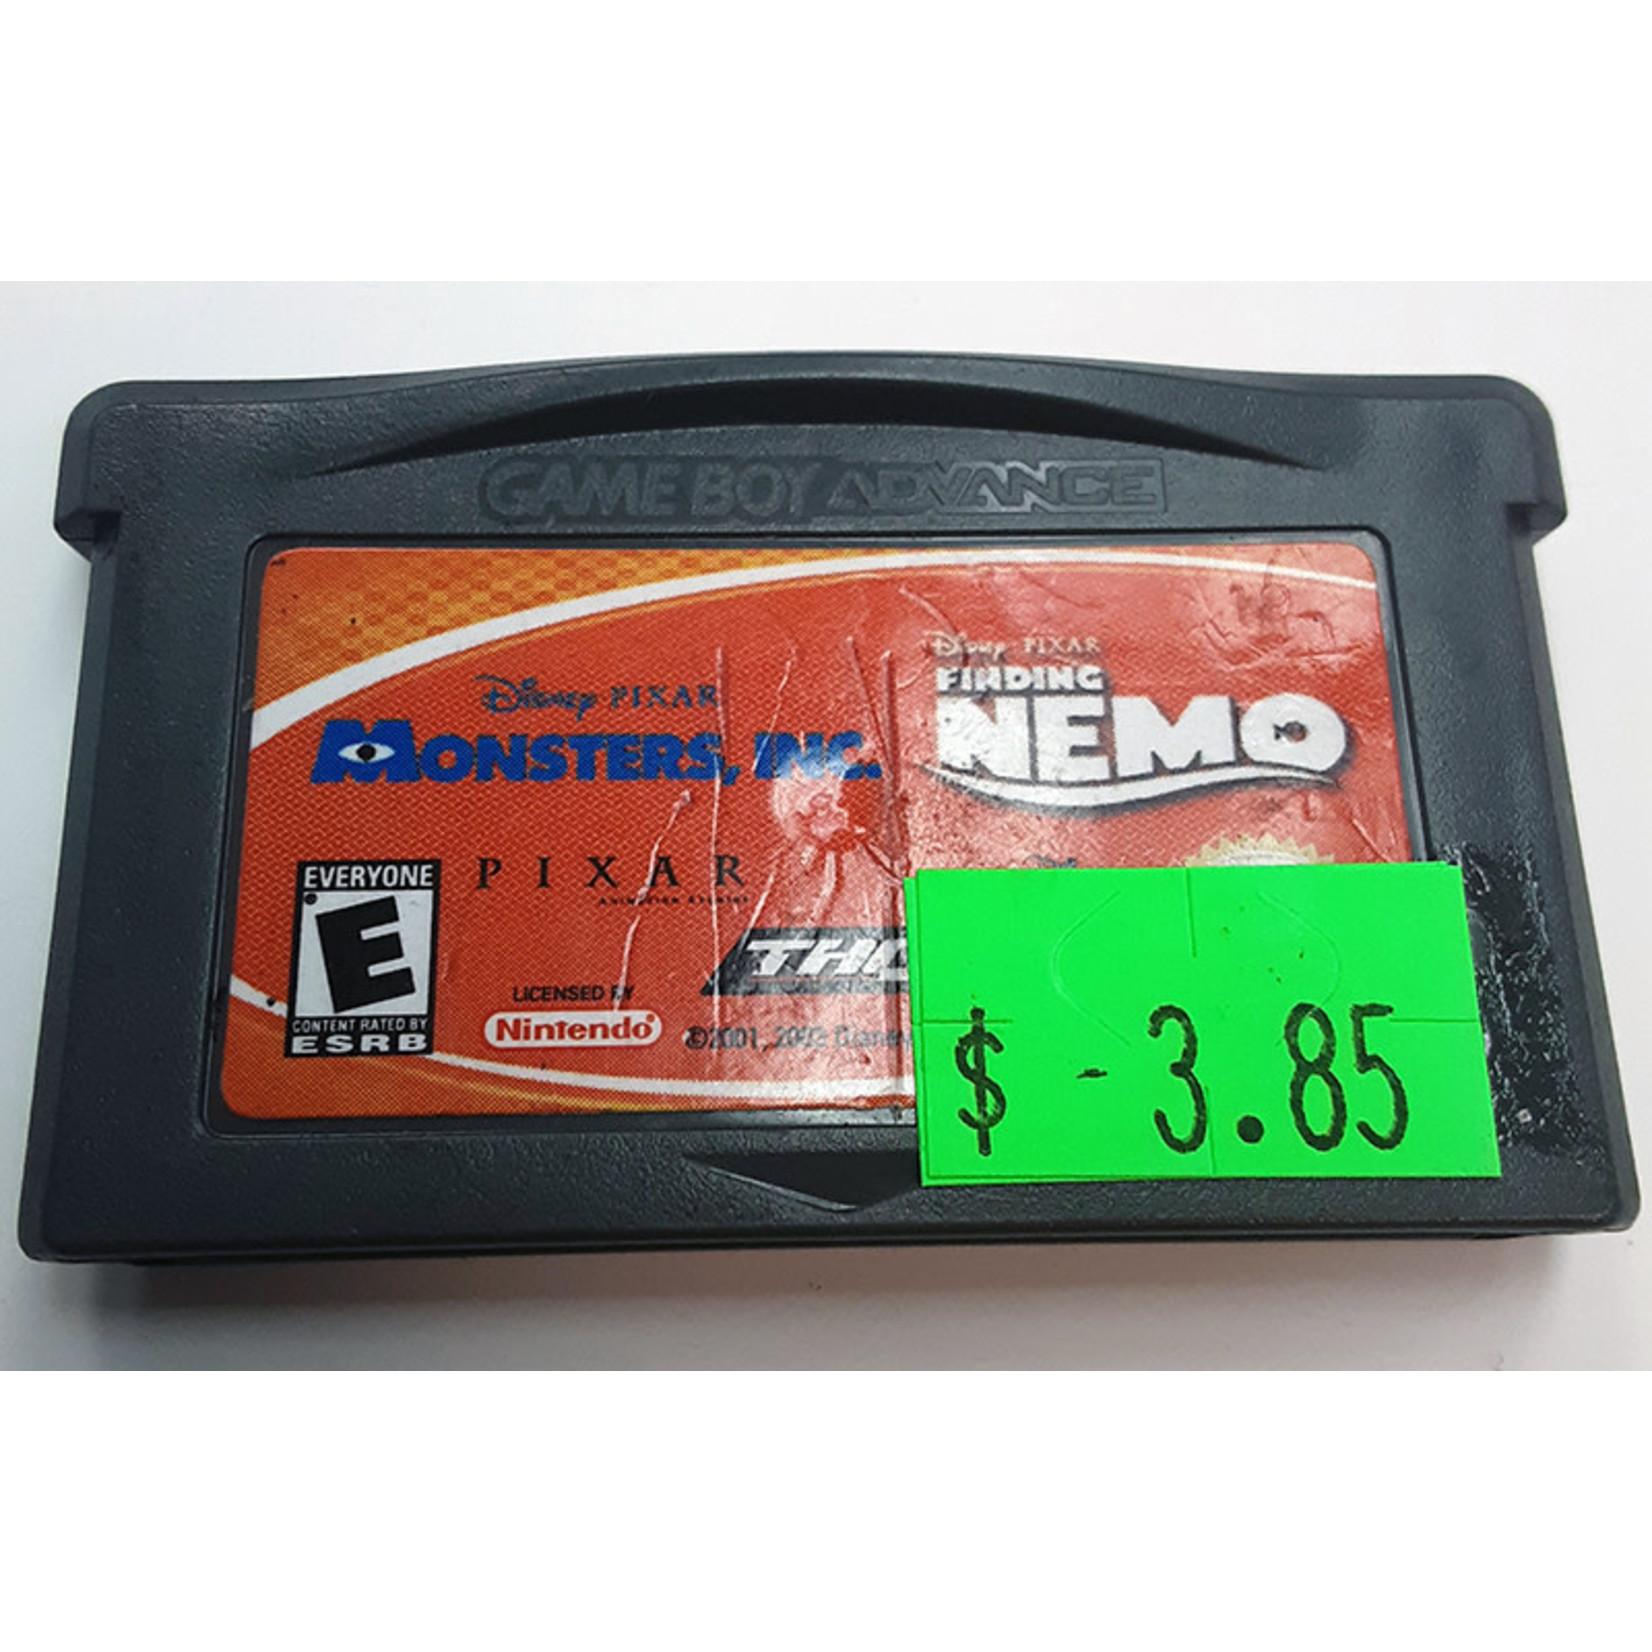 GBAu-Monsters inc / Finding Nemo (cartridge)